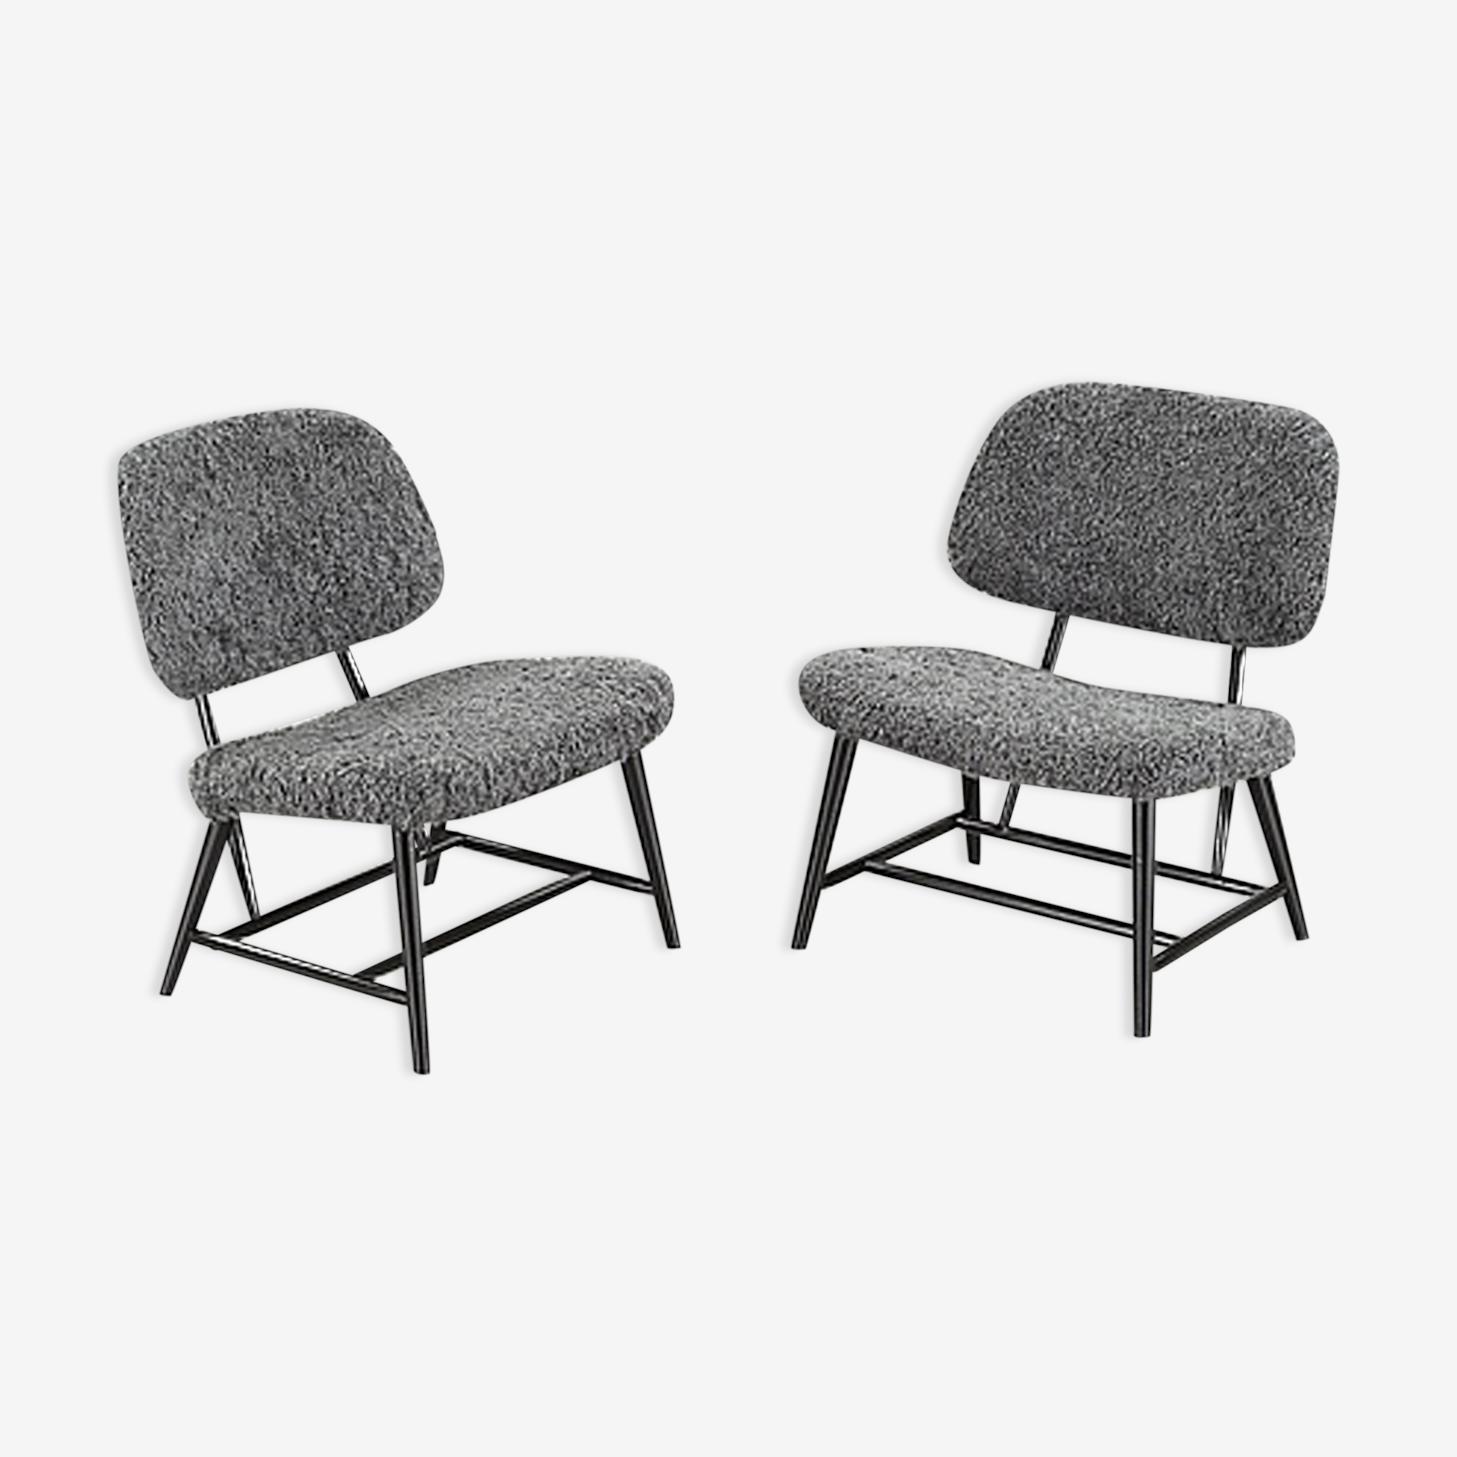 "Pair of ""Teve-Chairs"" of Alf Svensson"